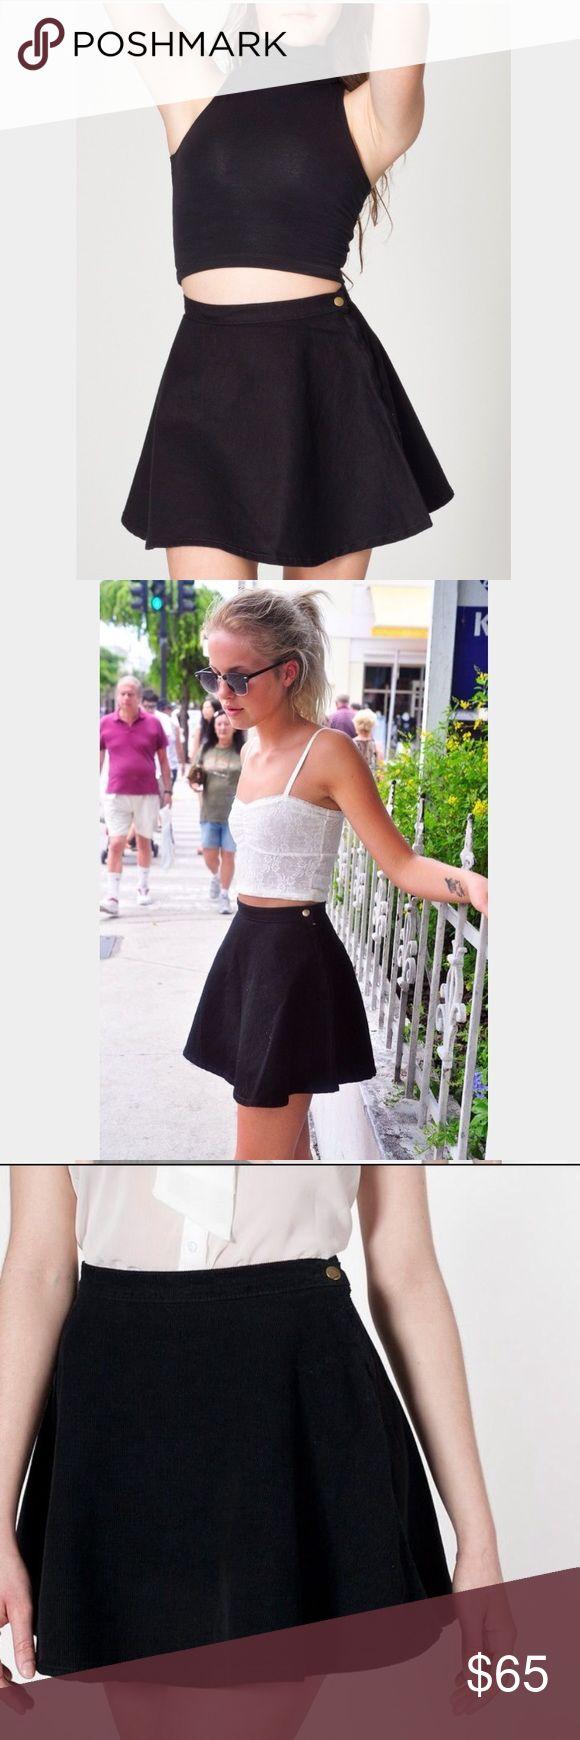 American apparel black skater circle skirt (denim Black denim. Size XS. Brand new with tags American Apparel Skirts Mini